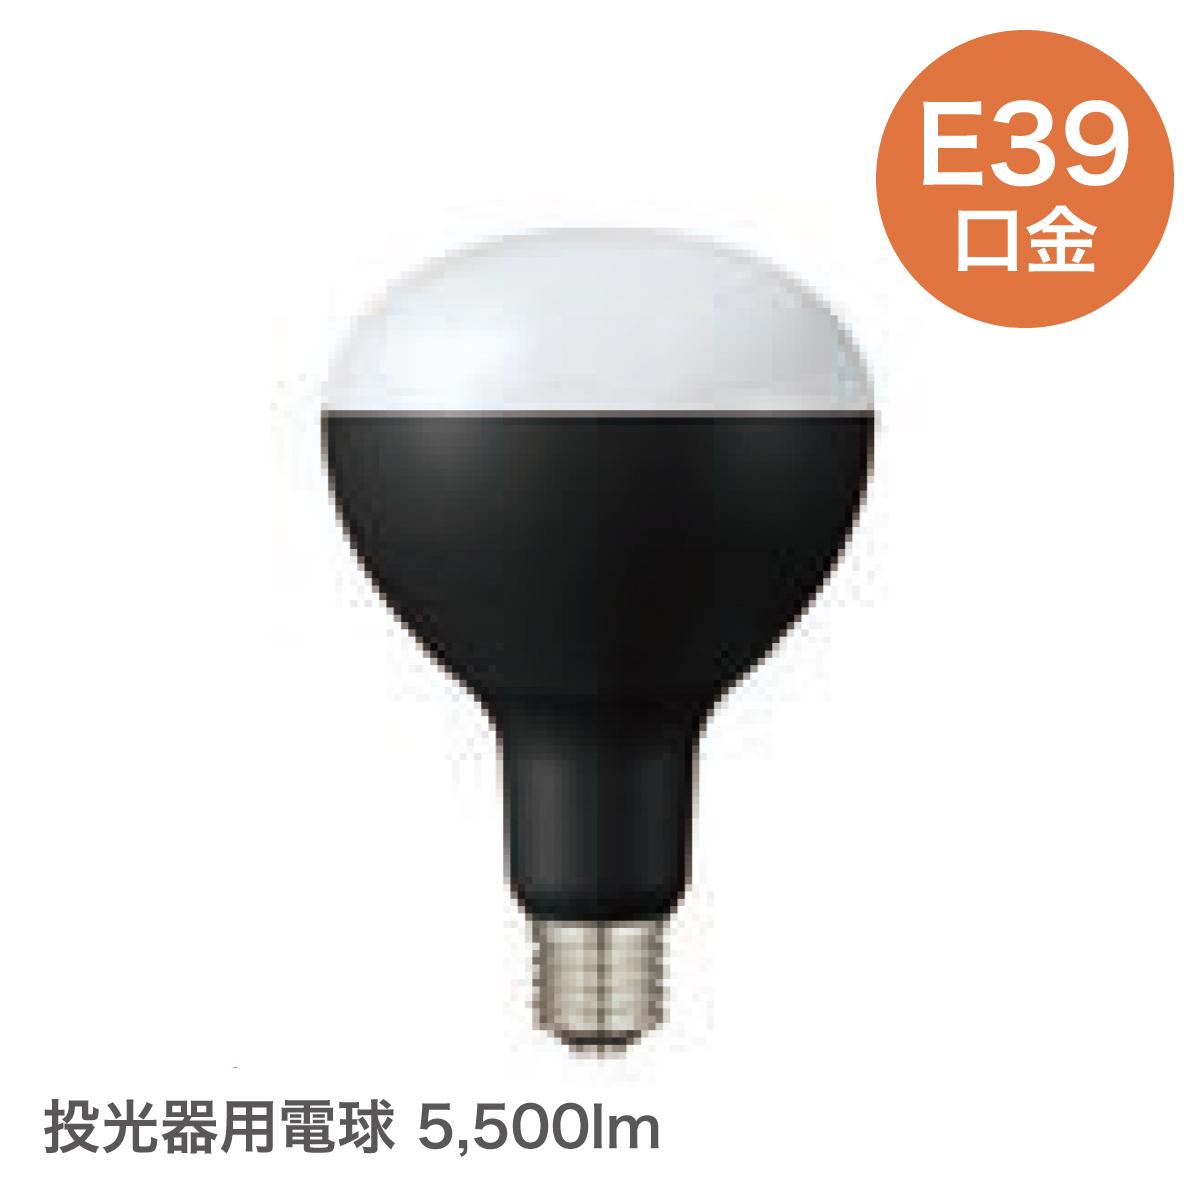 LED投光器 ワークライト 照明 省電力 長寿命 新作からSALEアイテム等お得な商品満載 防水 防塵 投光器 電球 LED 5 正規品 E39口金 500lm 投光器用交換電球